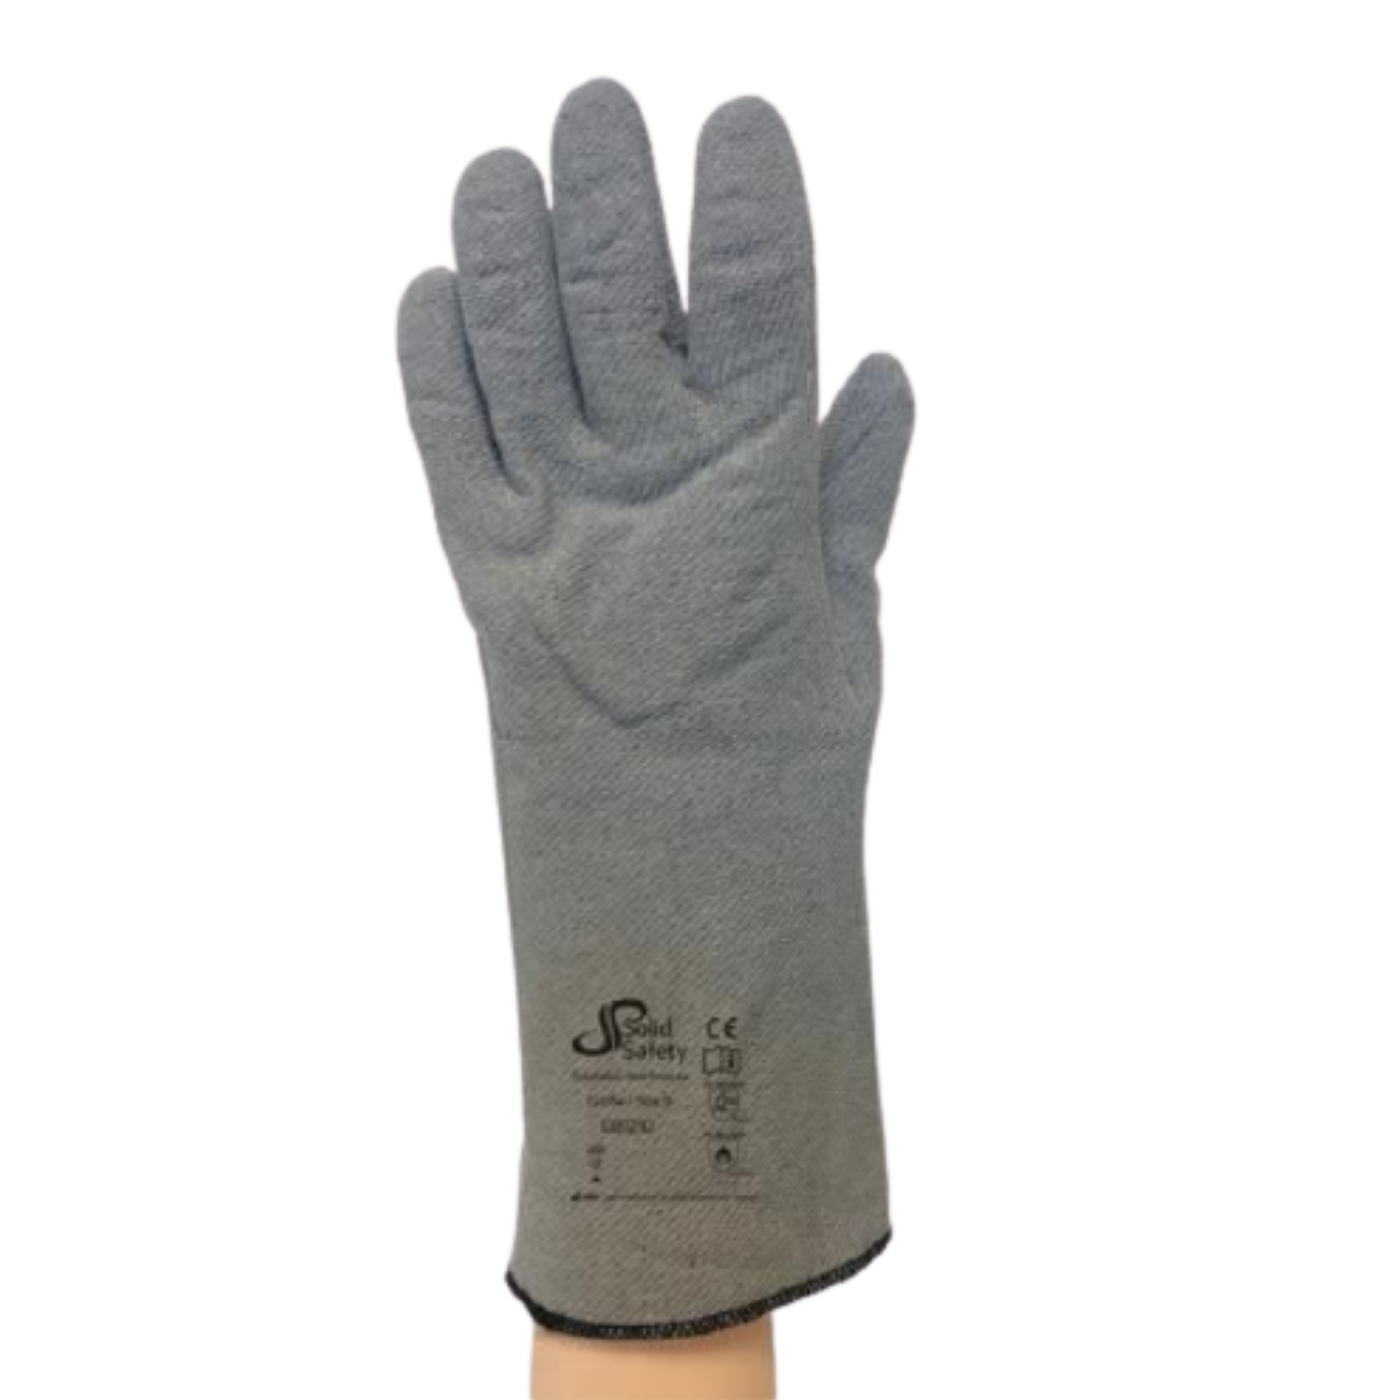 Rękawice termiczne Ampri 081210 Heat Protector